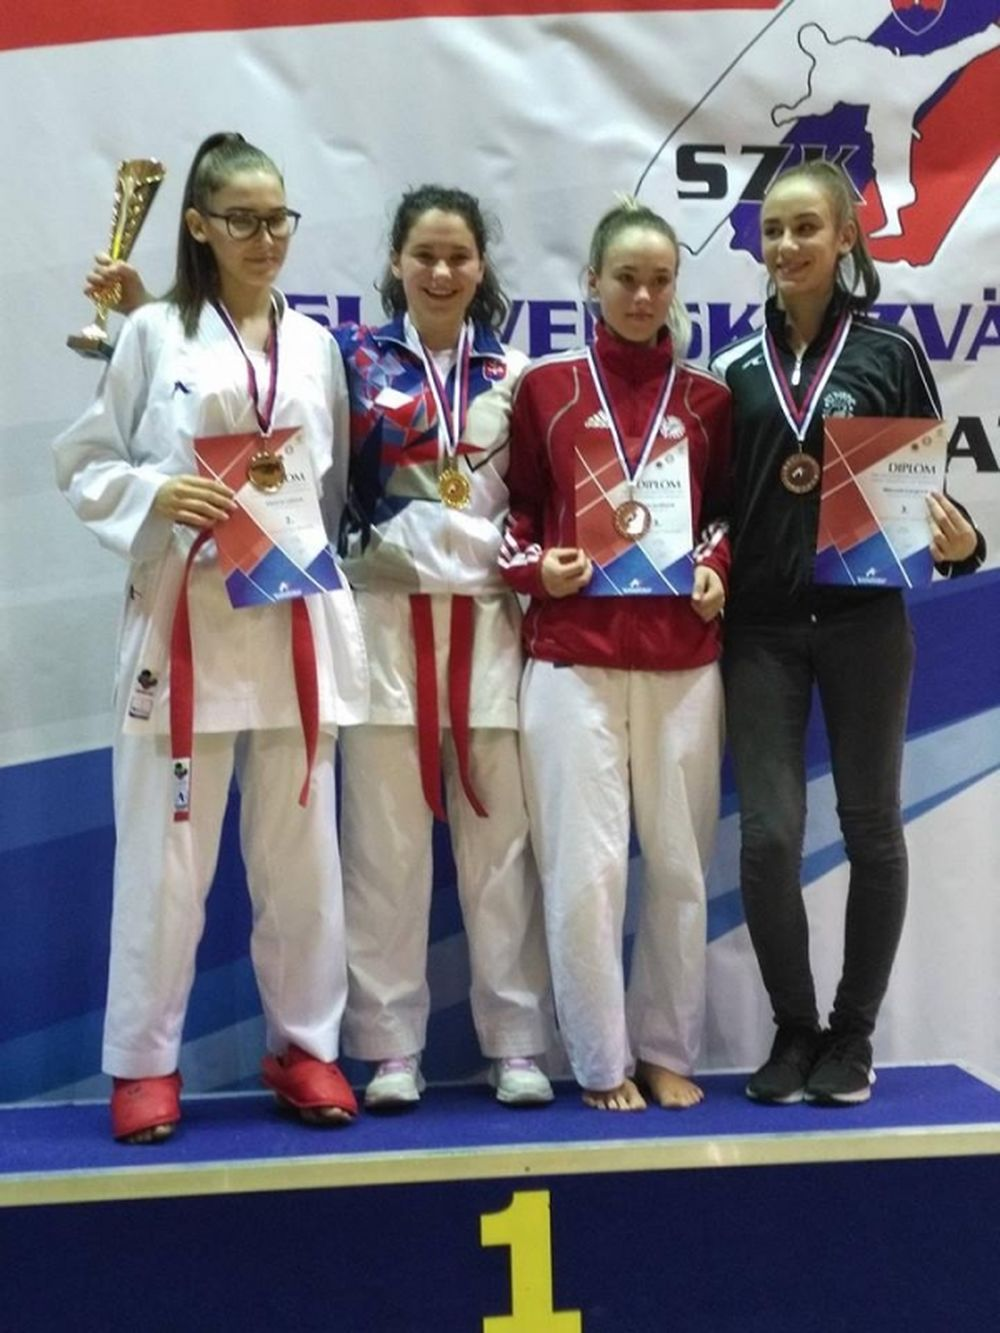 Úspechy Karate klub Žilina Trnava 3.12.2016 - 4.12.2016, foto 8